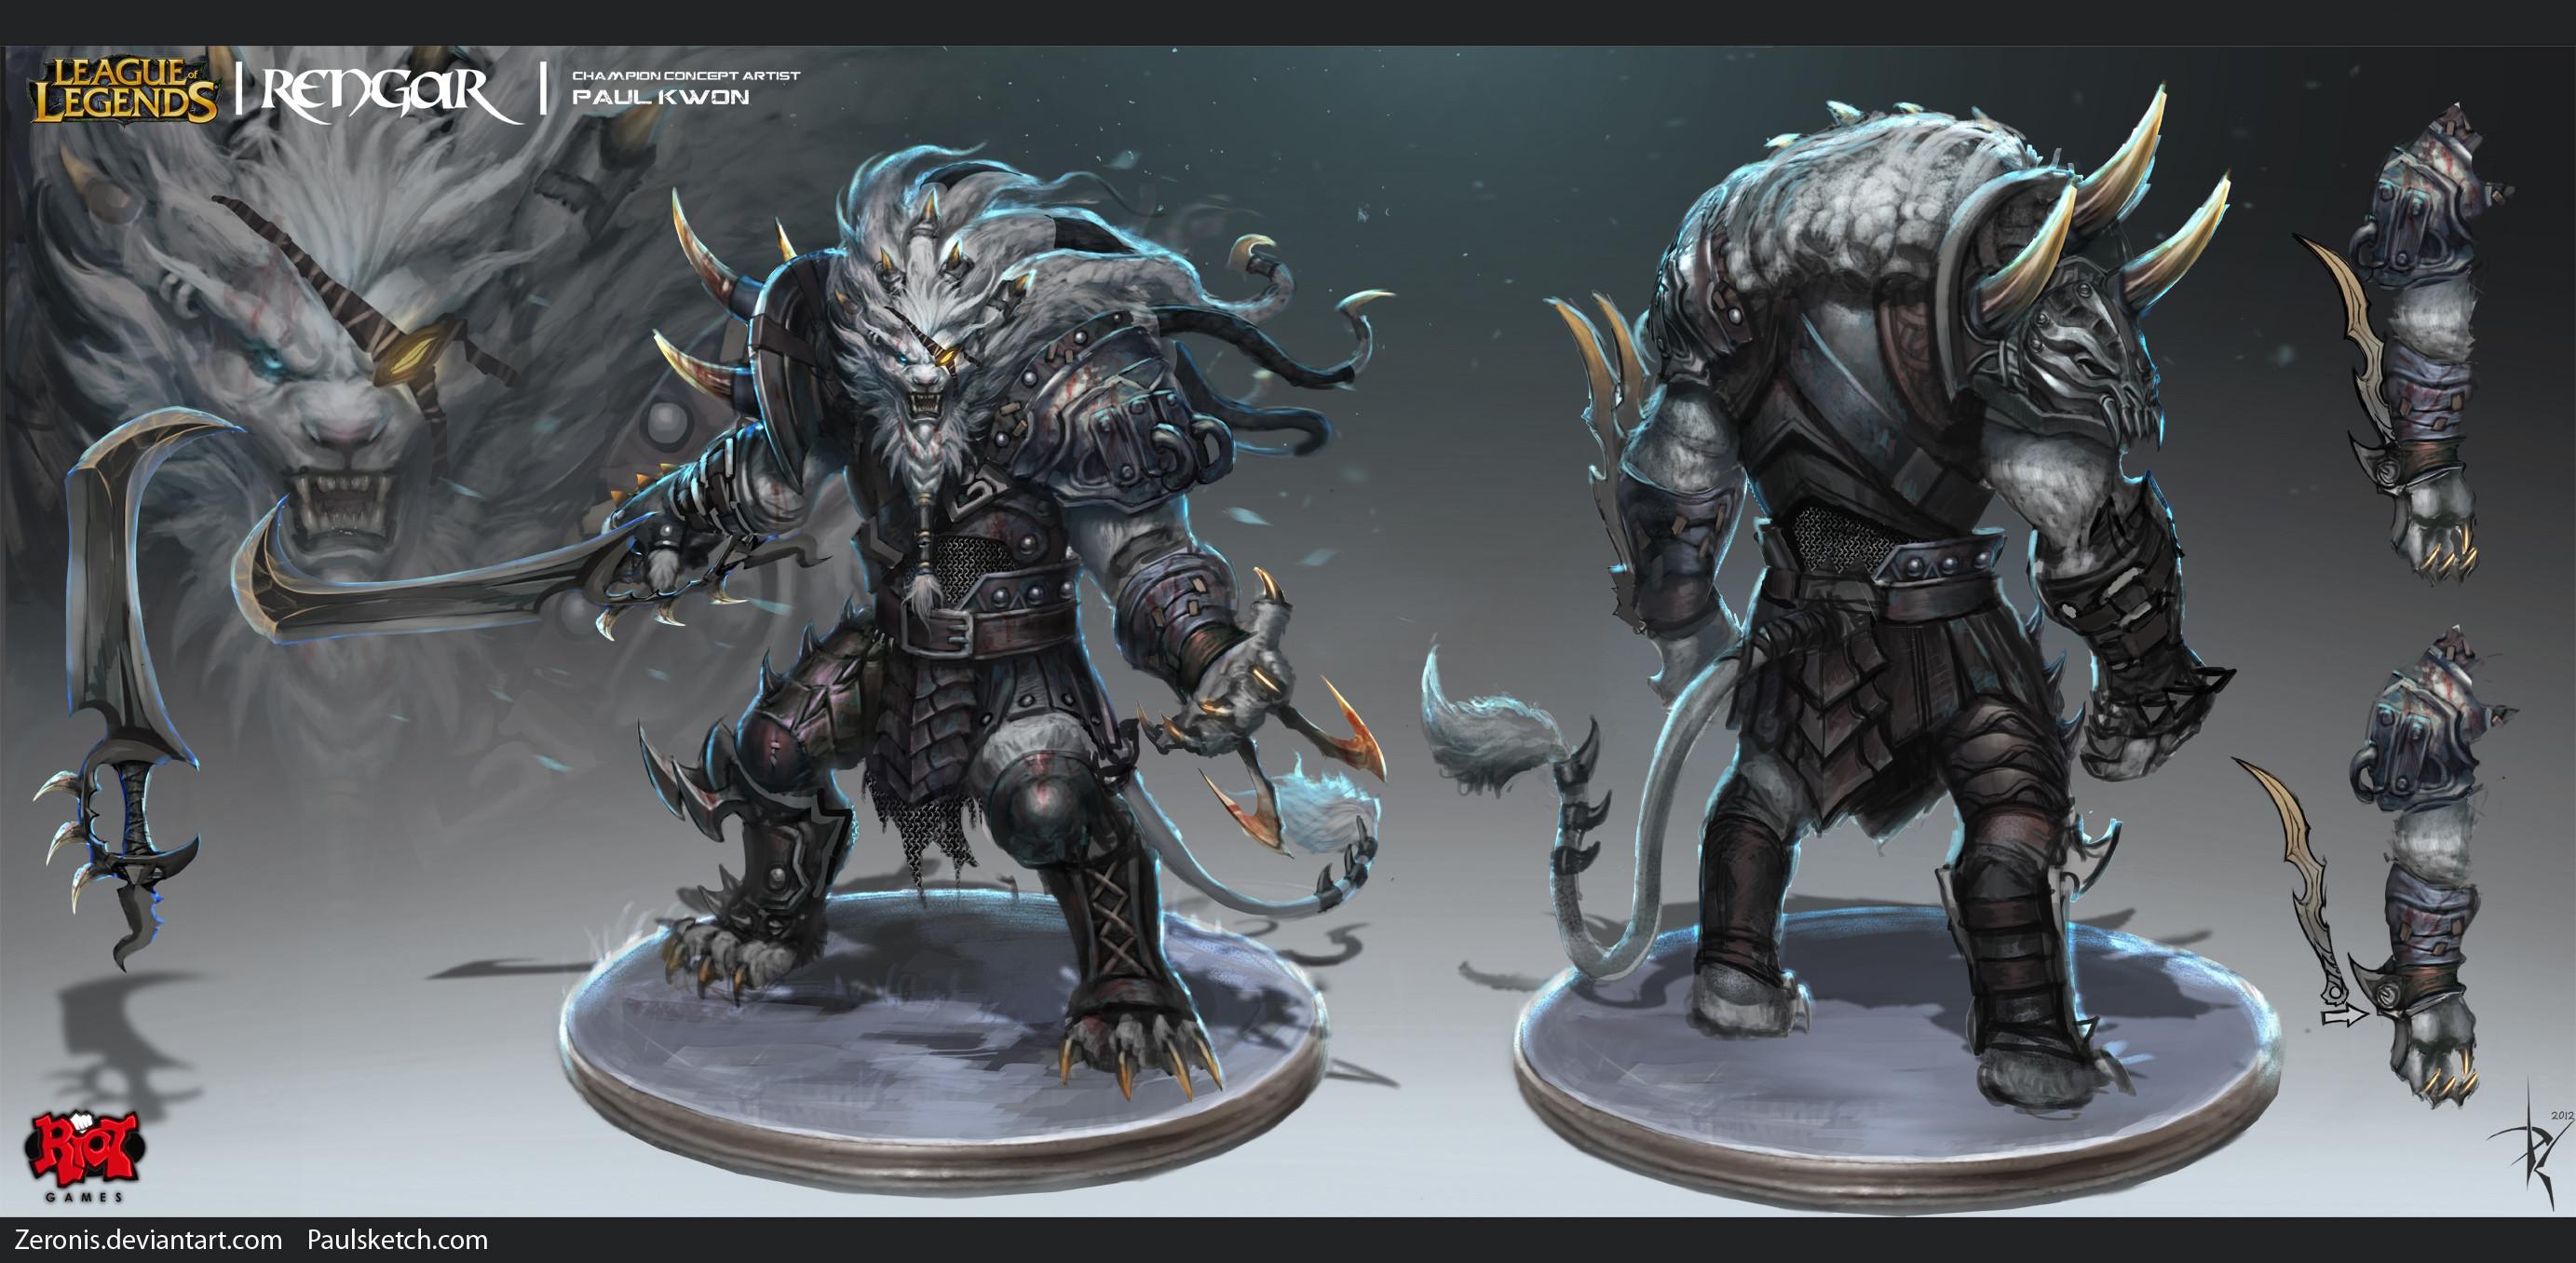 Rengar Concept by Zeronis League of Legends Artwork Wallpaper lol